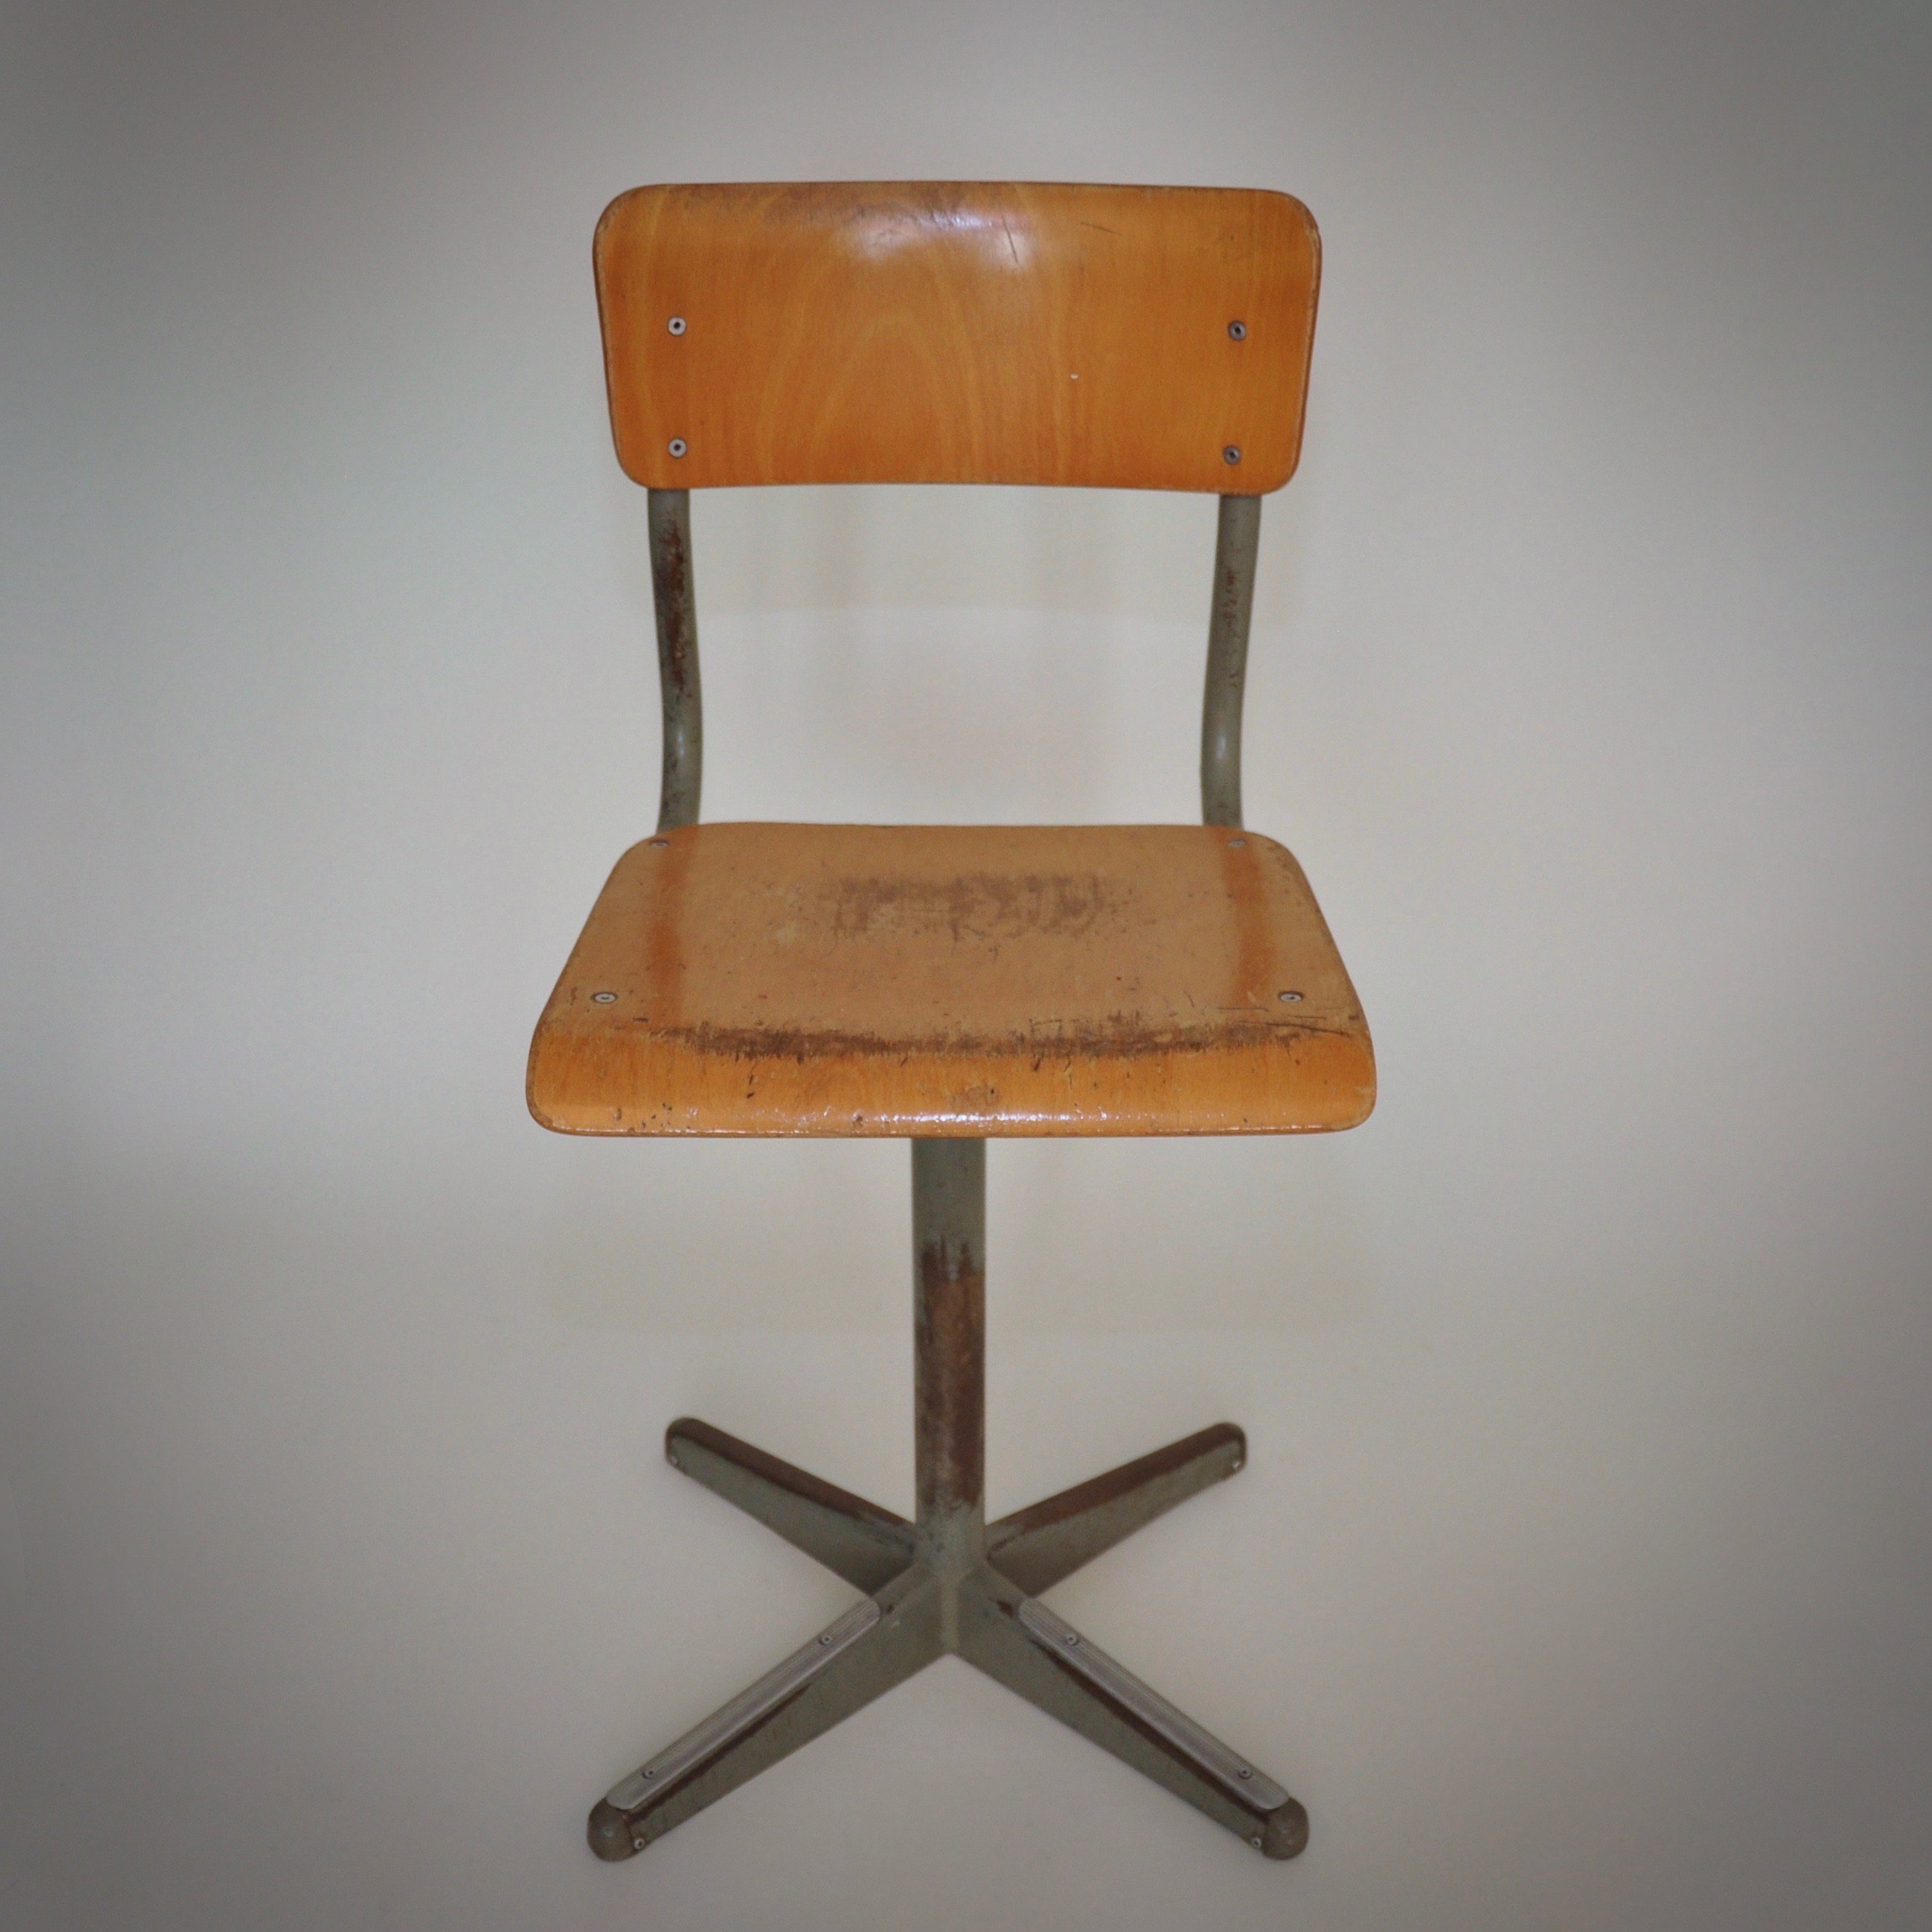 Mooie Stevige Bureaustoel.Industriele Stoel Ketsch Vintage Check Onze Webshop